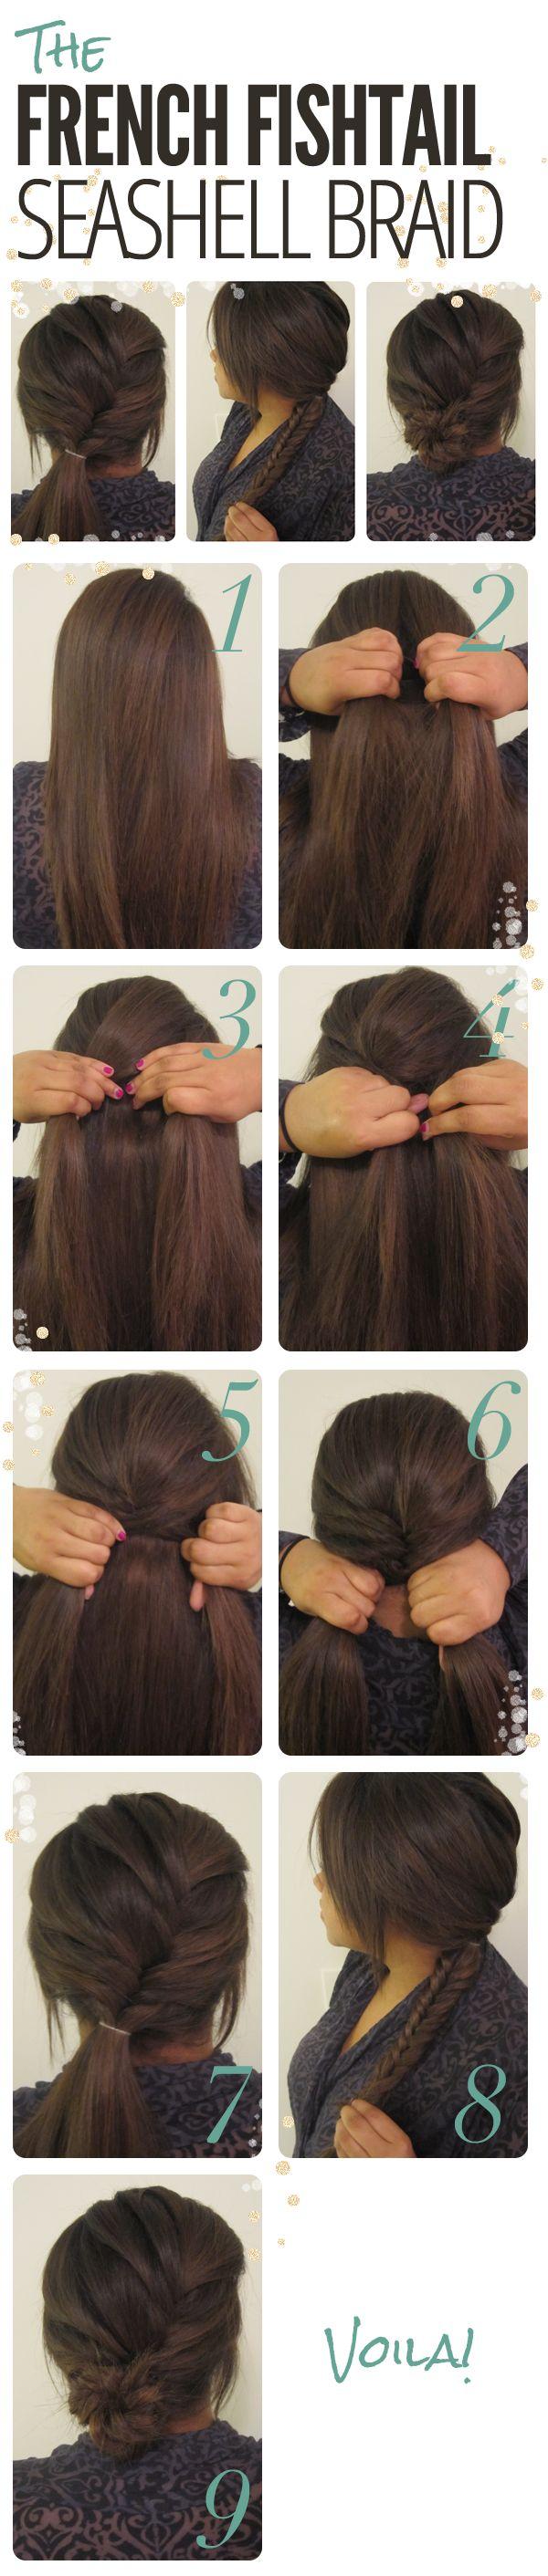 French Fishtail Seashell / Braids #hair